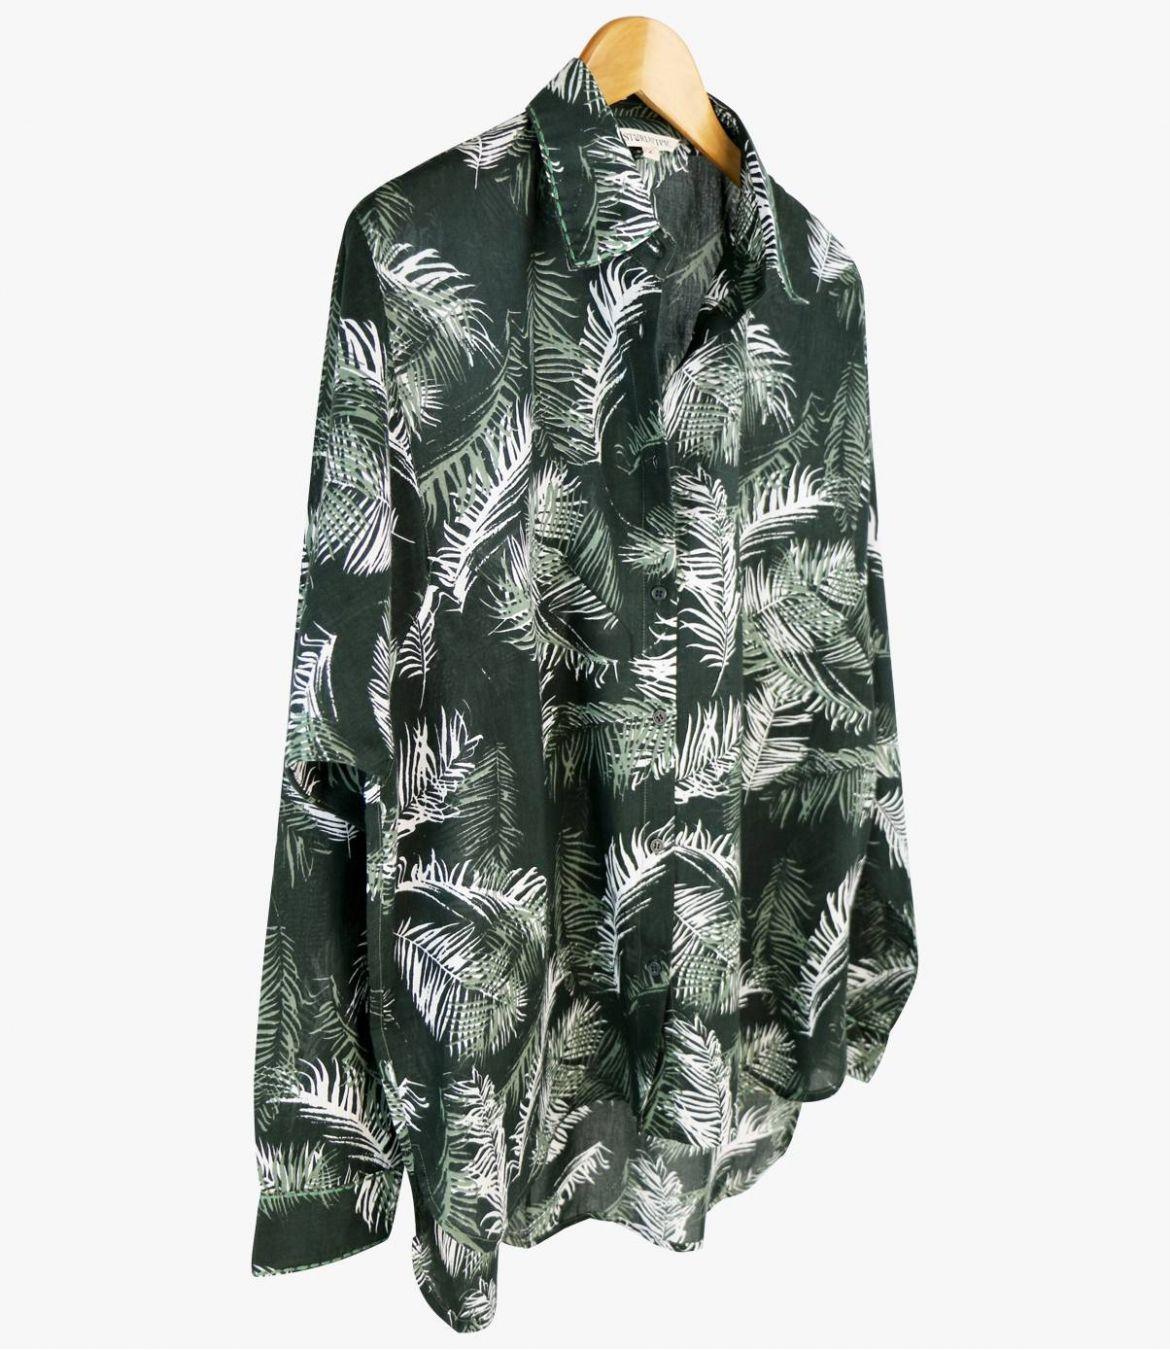 COSY PALOMA Cotton Shirt for Women Storiatipic - 2